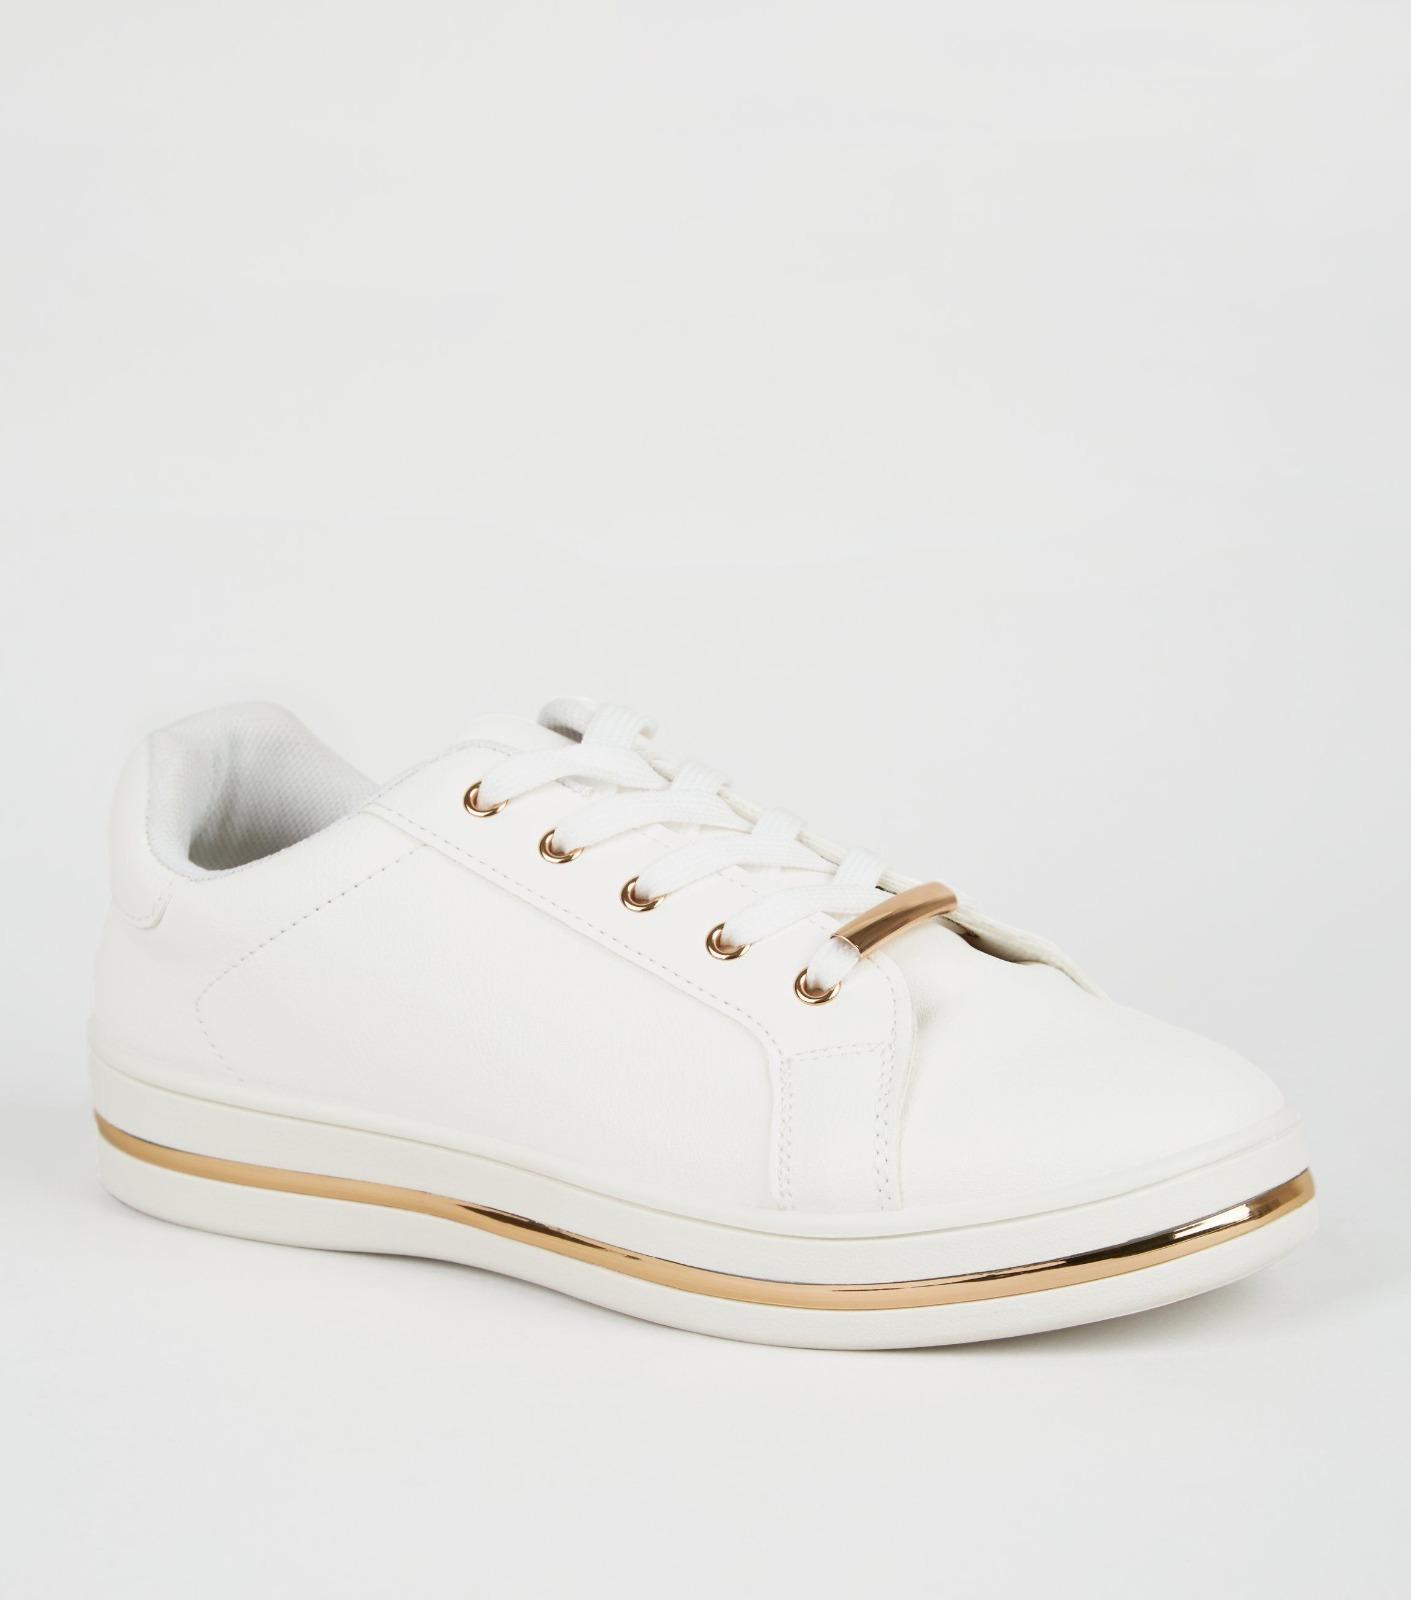 EX STORE Ladies Womens White Leather